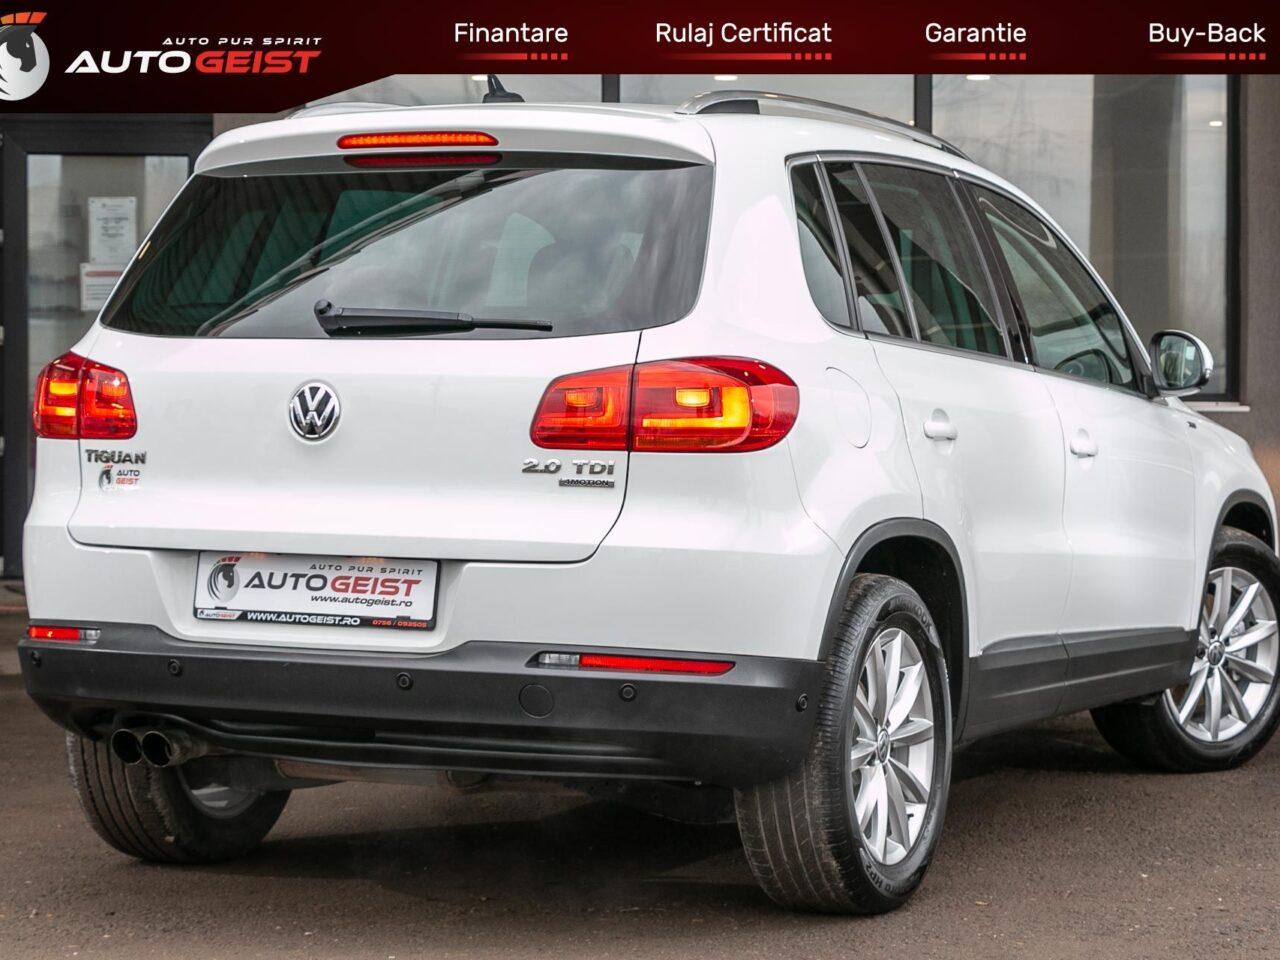 VW-TIGUAN-2015-manual-3465